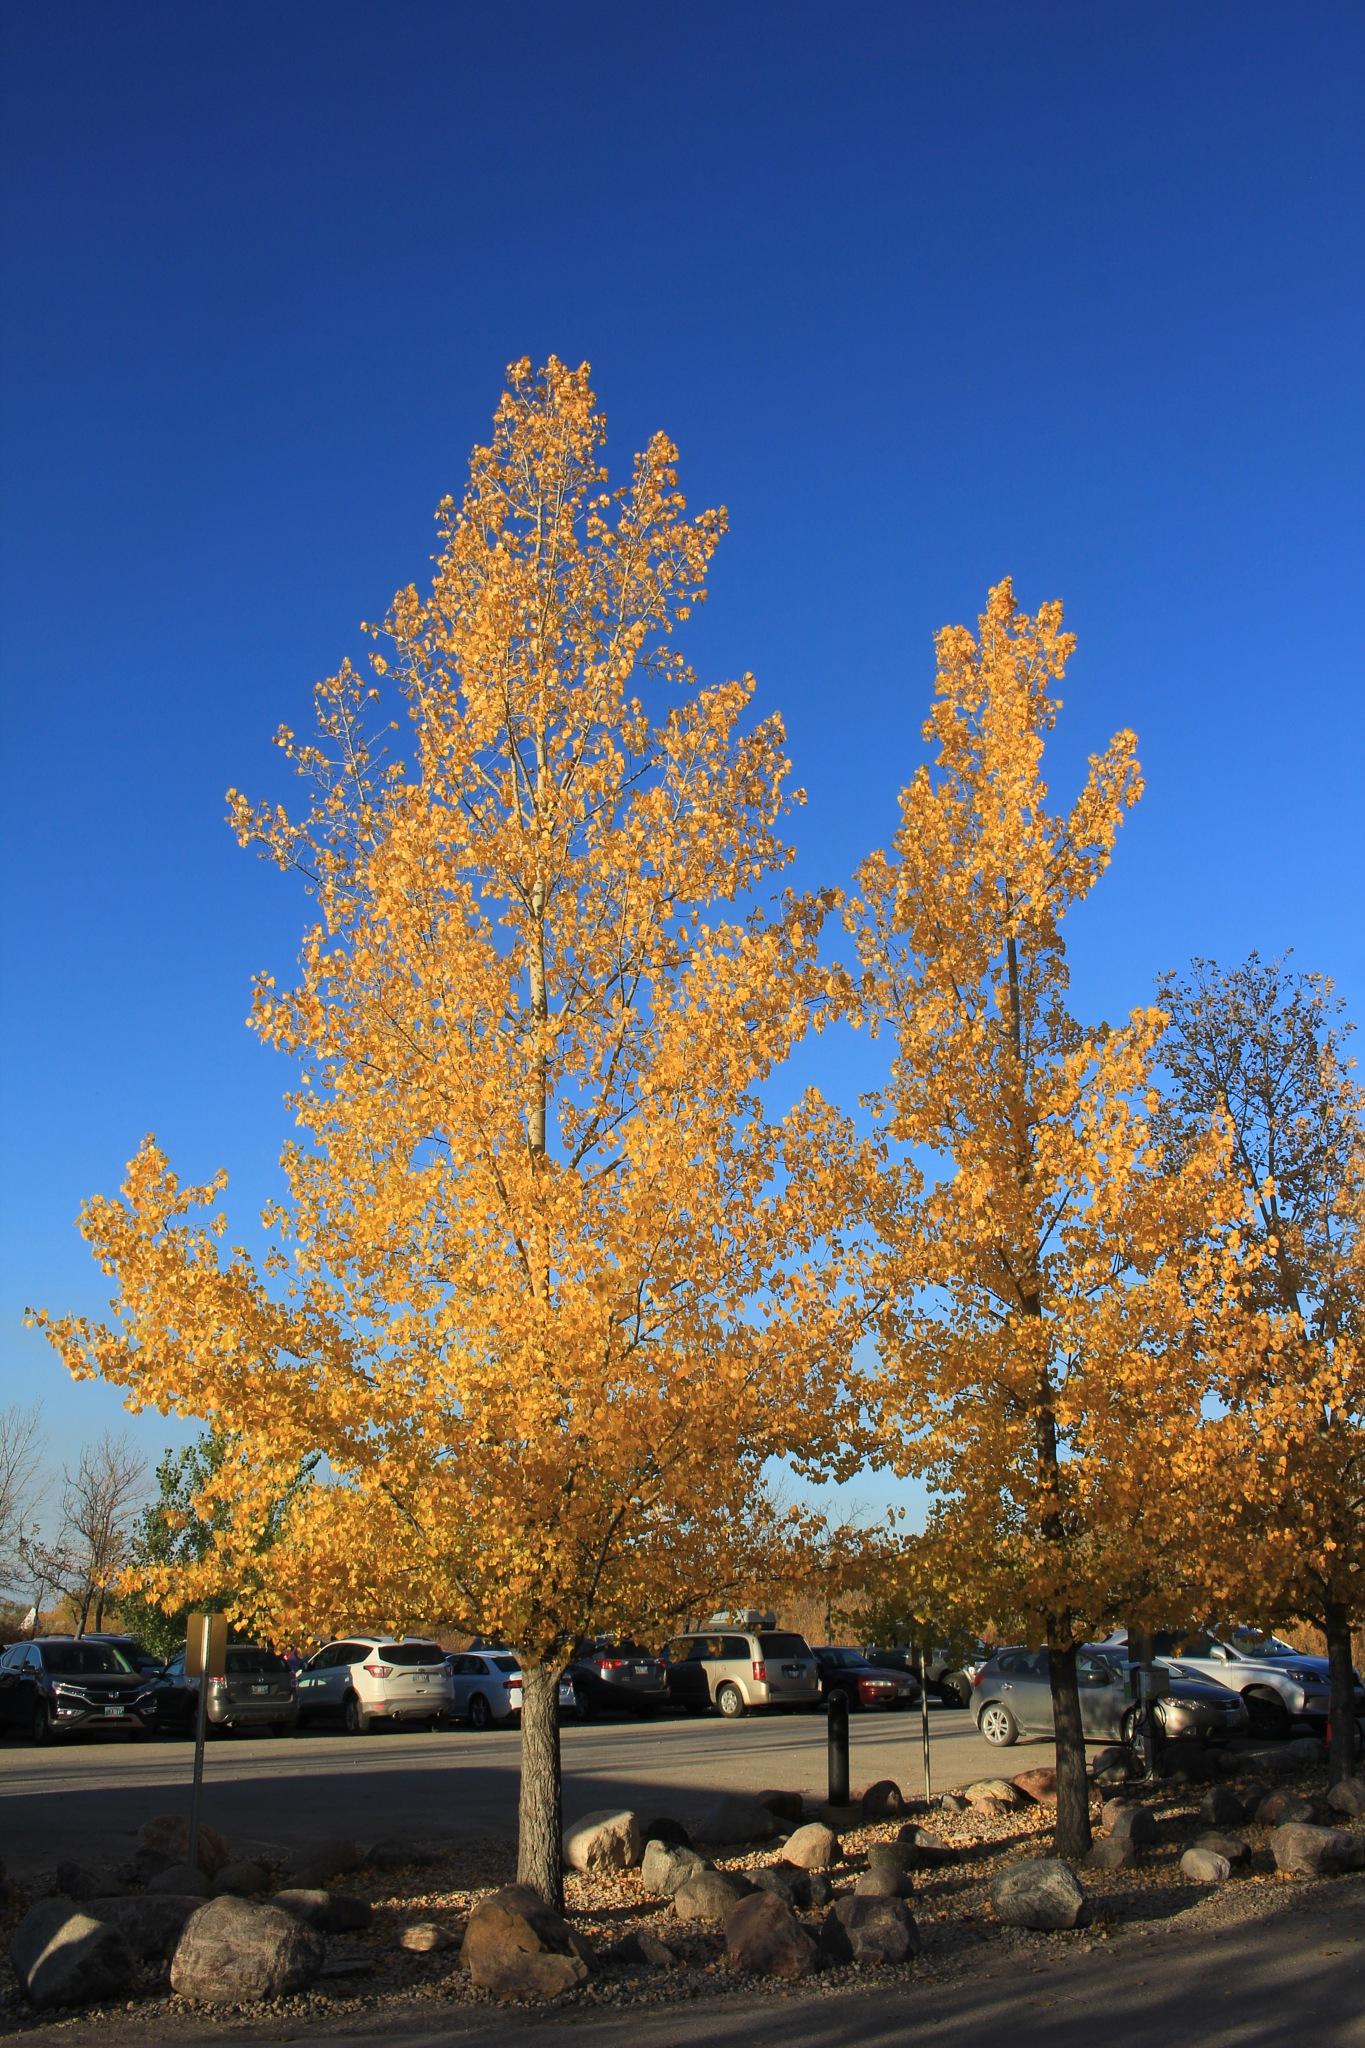 Autumn Colour by David Imrie